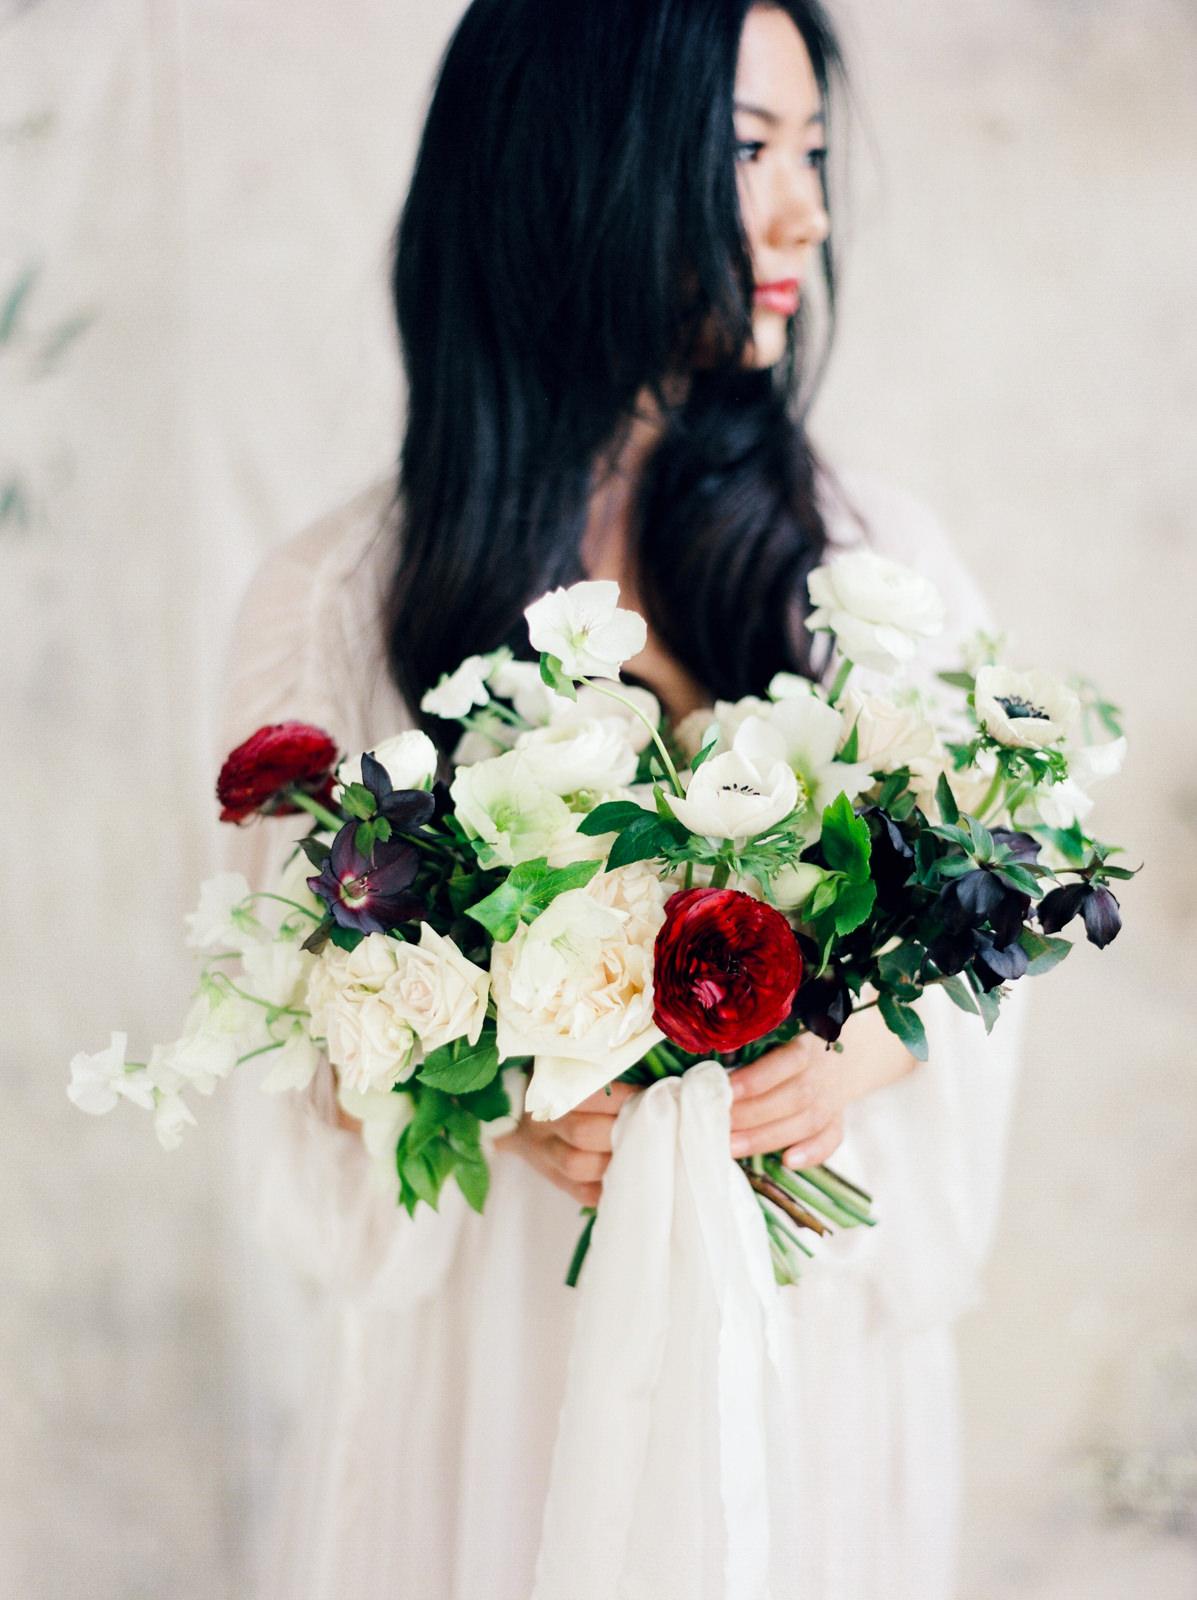 sandra-chau-stylist-fine-art-editorial-shoot-wedding-dress-hair-rosebouquet-unearthingtc-1.jpg